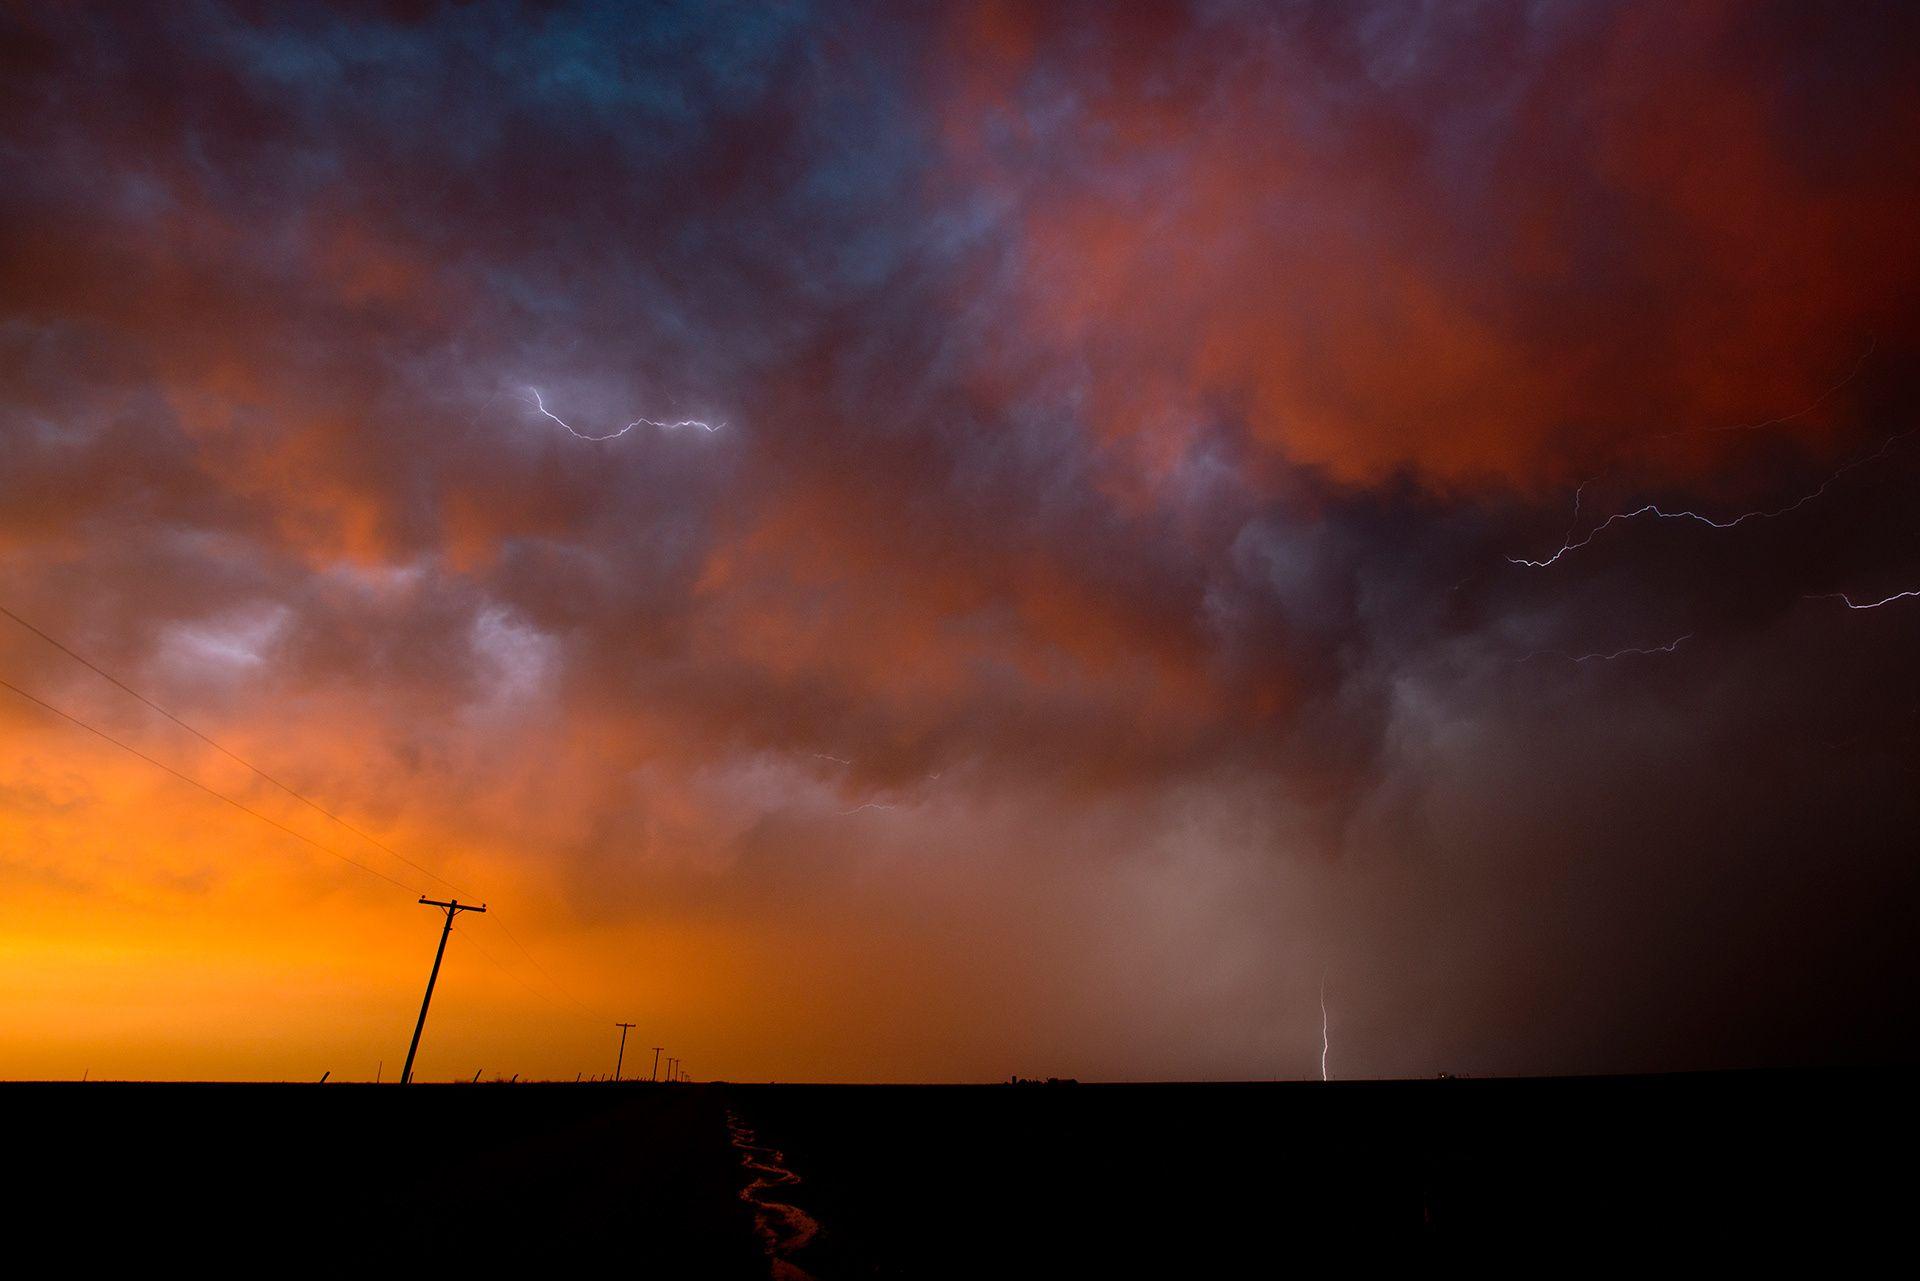 cmredwine, cameron redwine, lightning, photograhy, weather